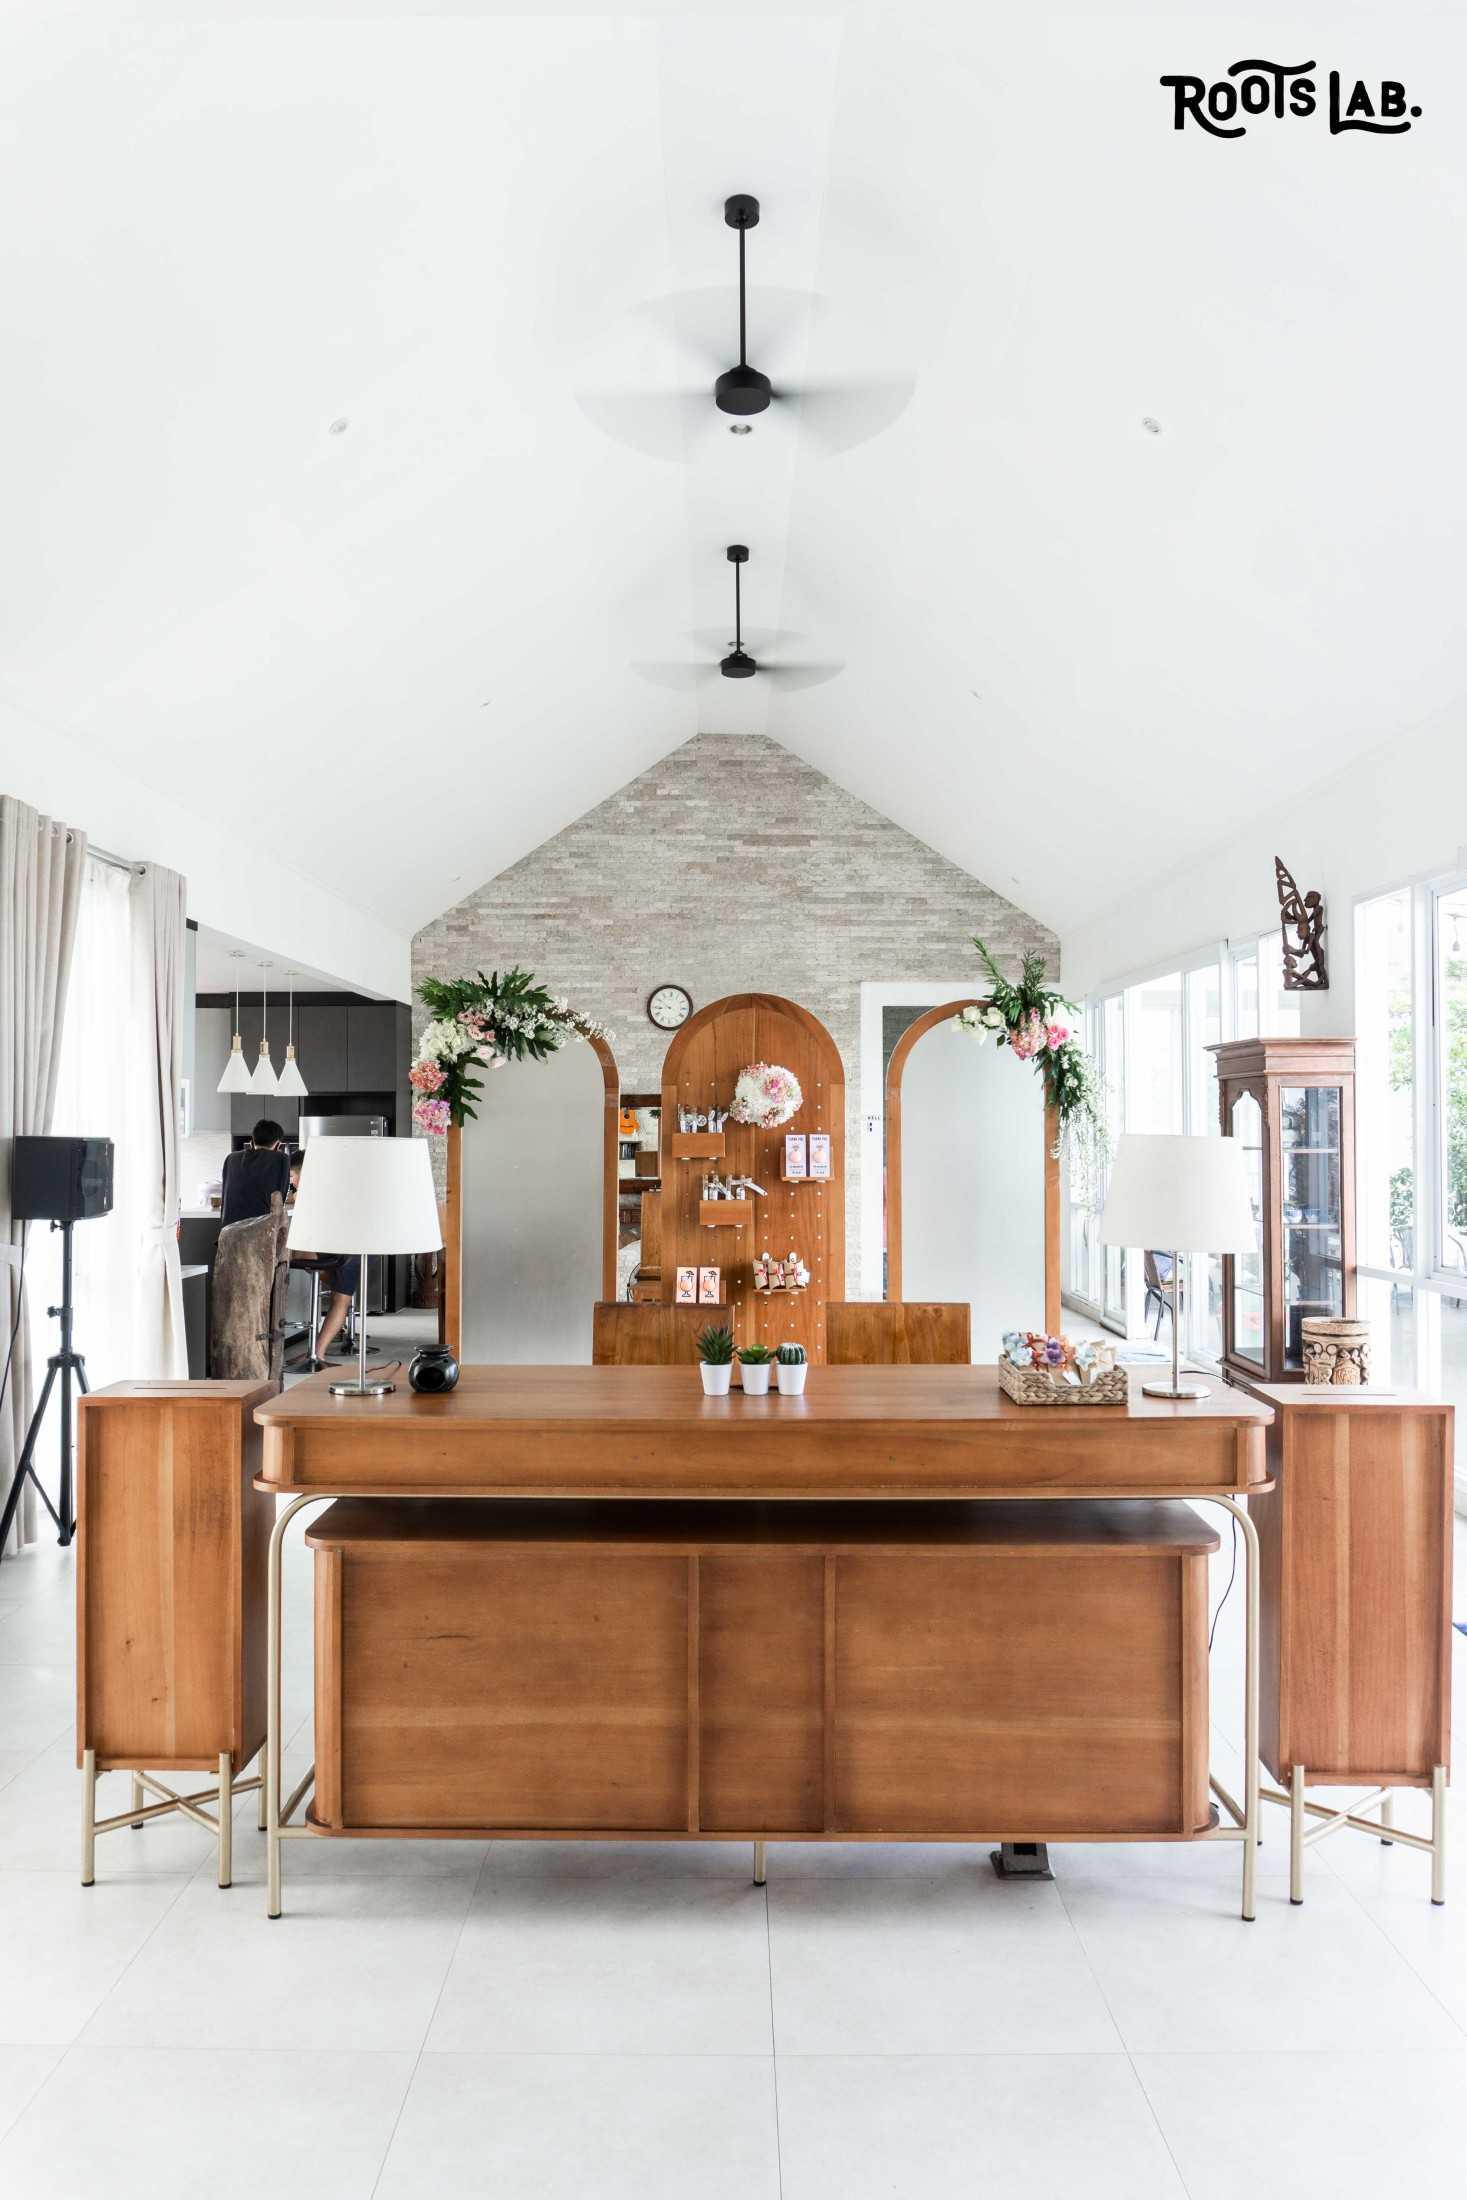 Jasa Interior Desainer Rootslab di Jakarta